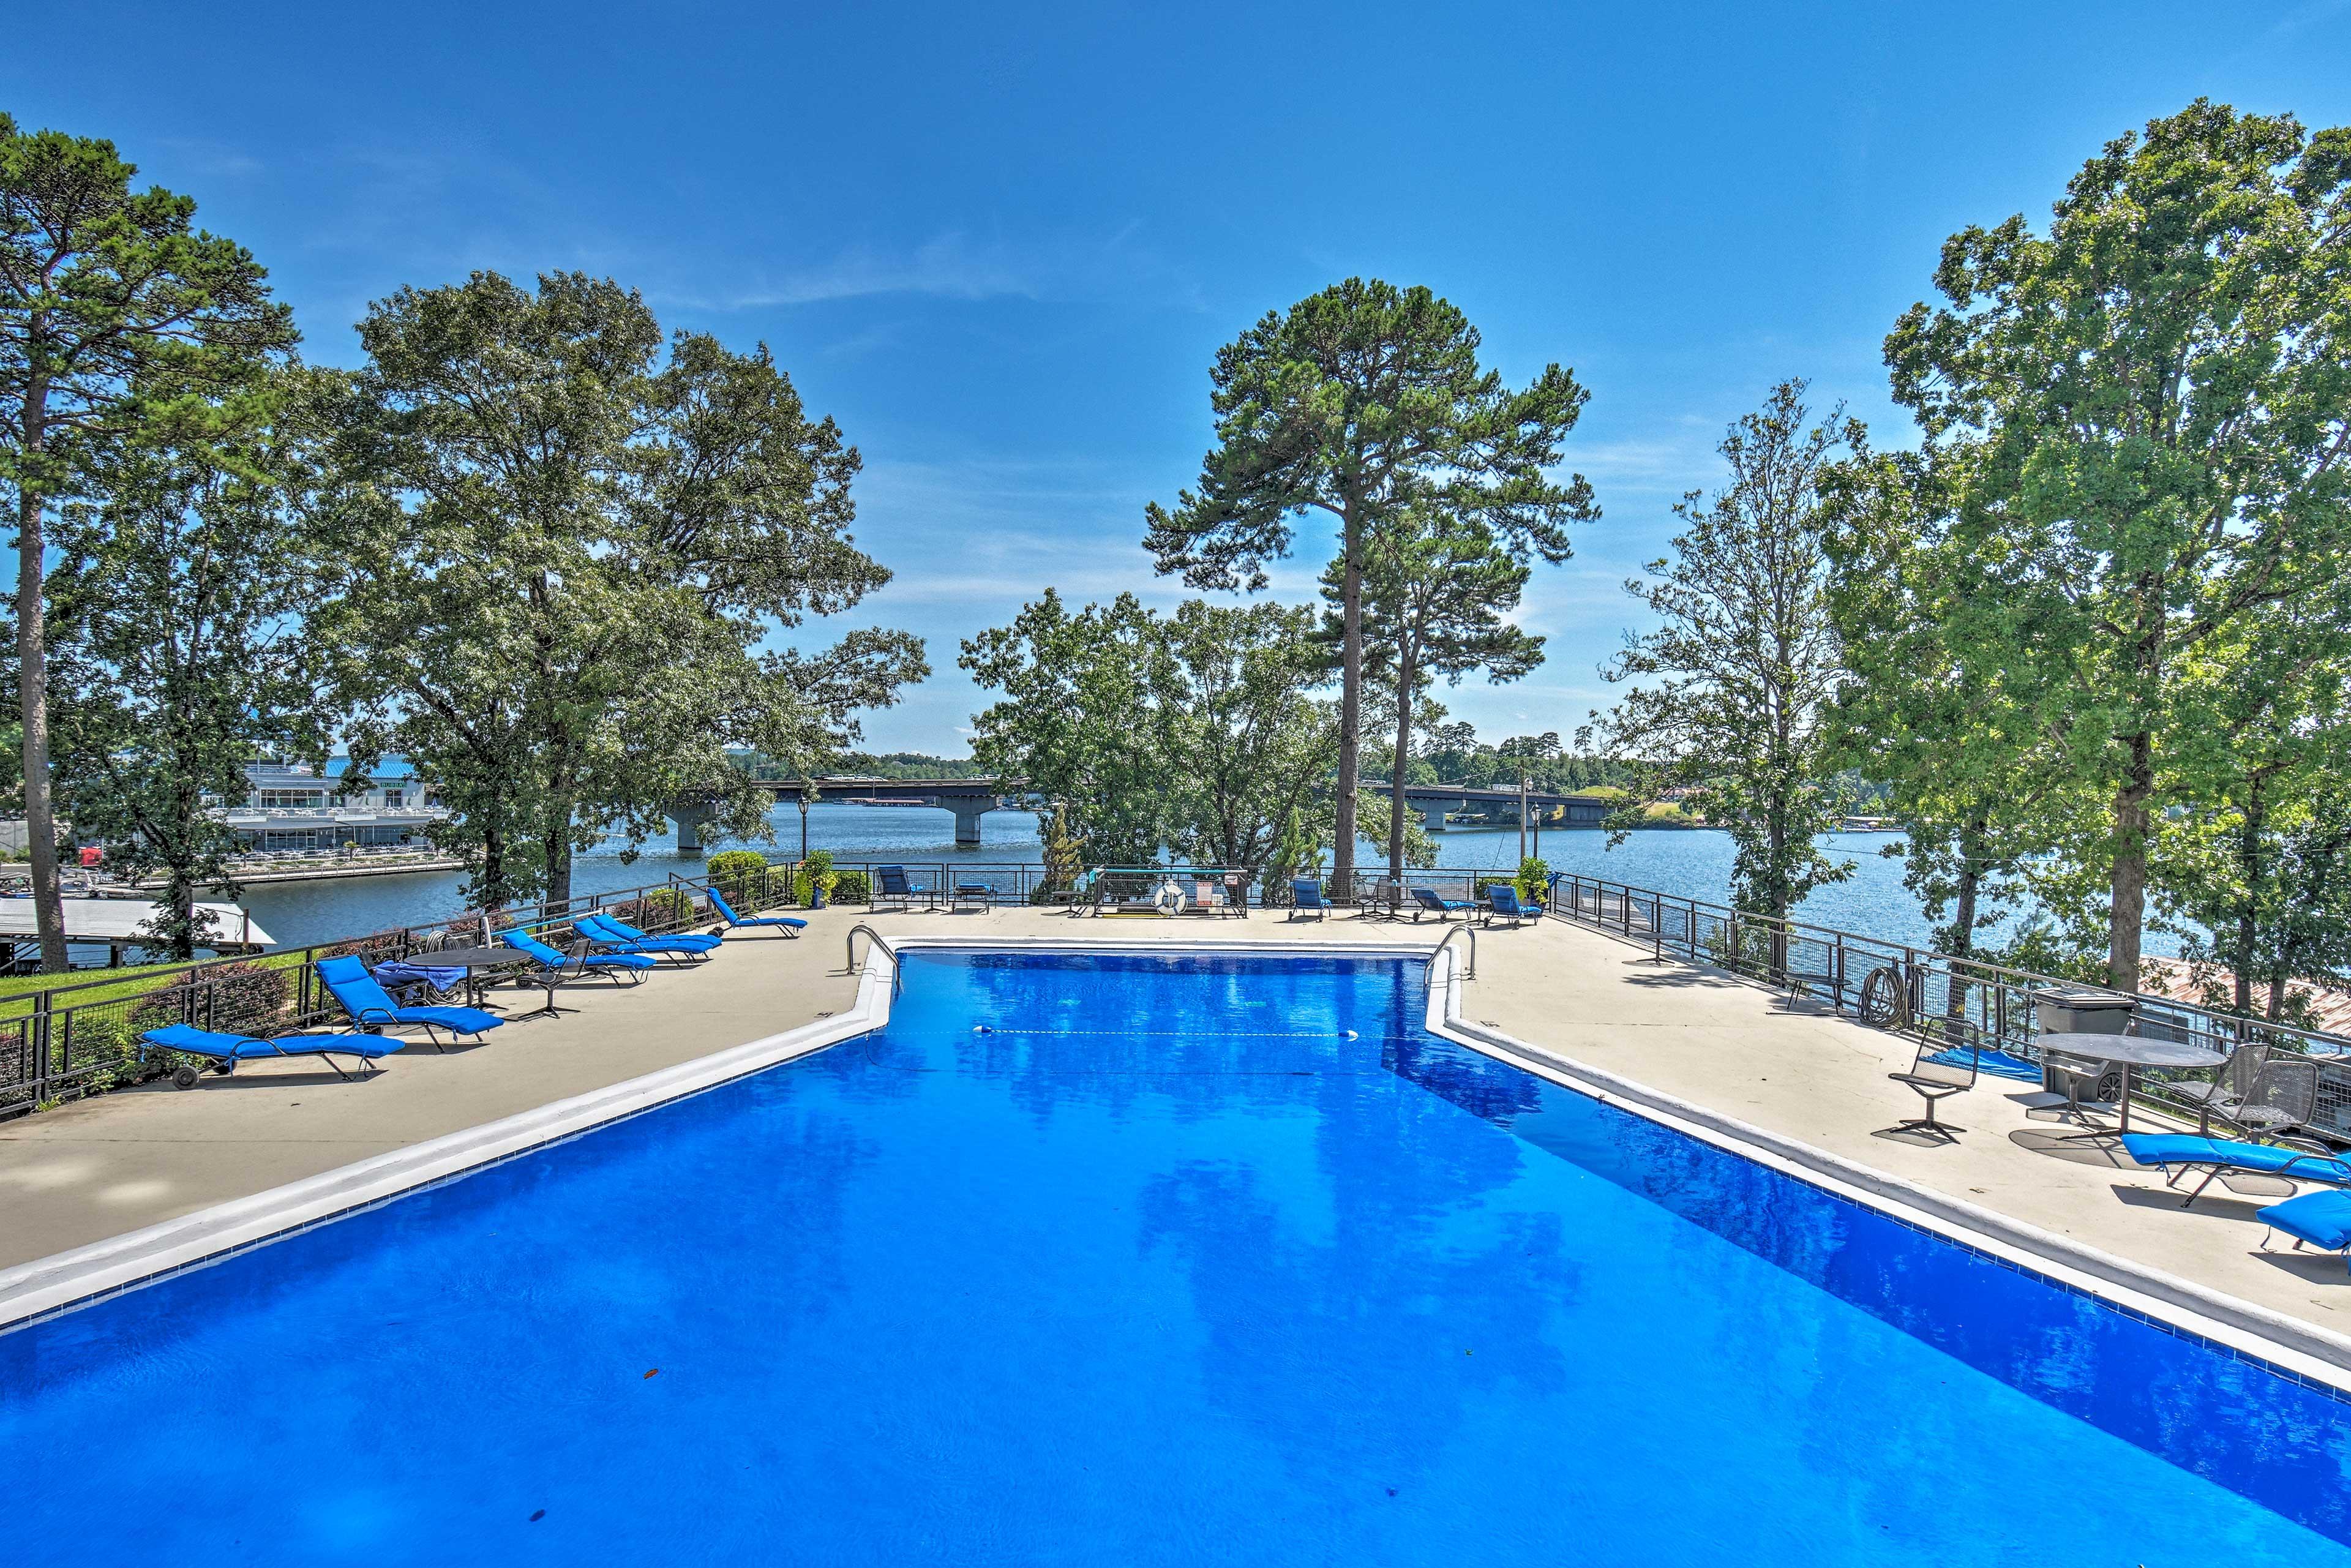 Lounge poolside with Lake Hamilton views.